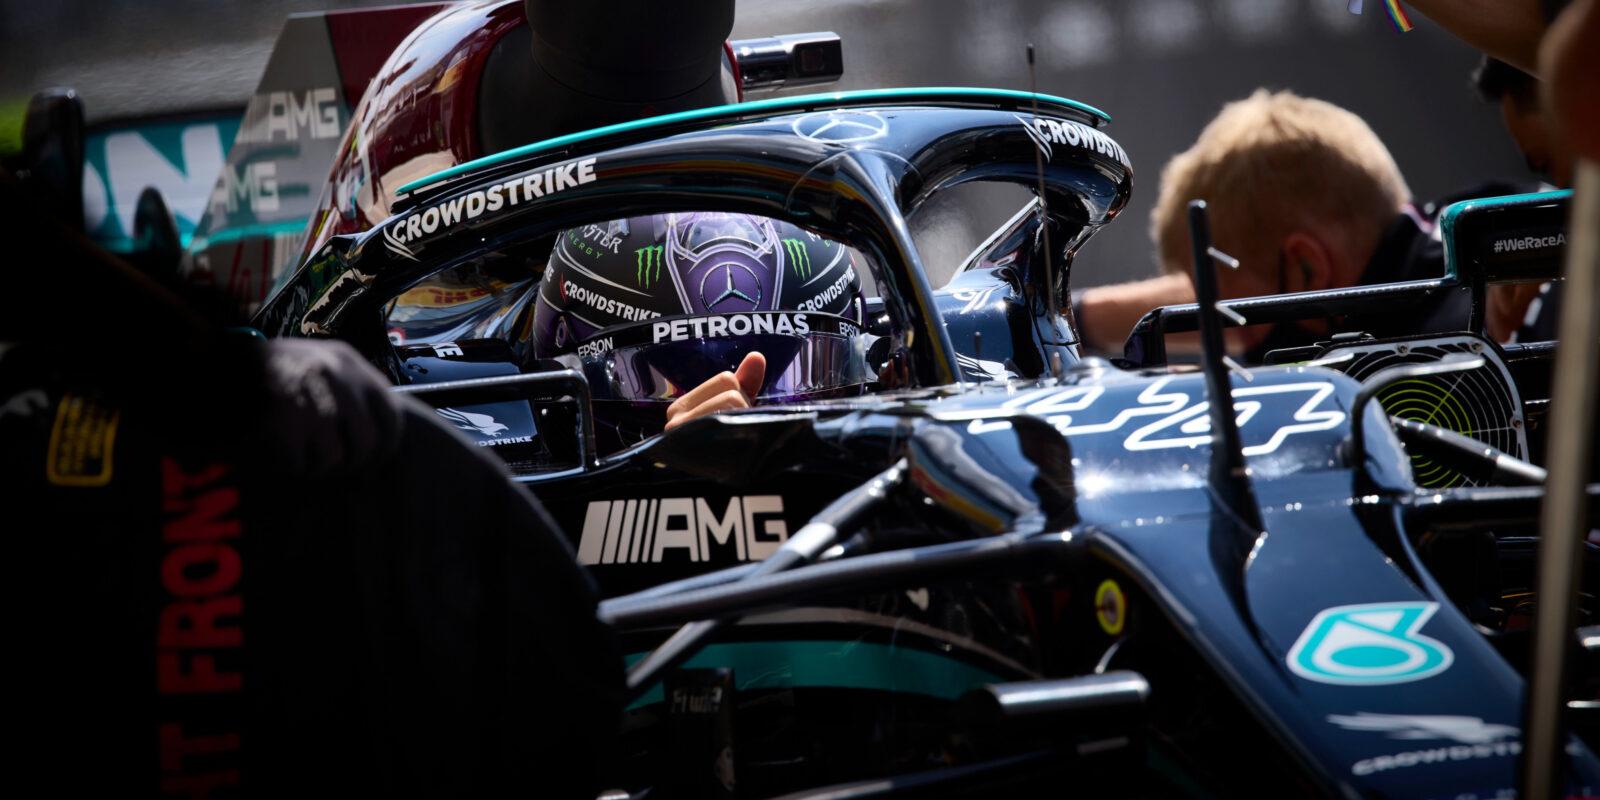 Kvalifikaci v Maďarsku ovládl Hamilton, Sainz havaroval